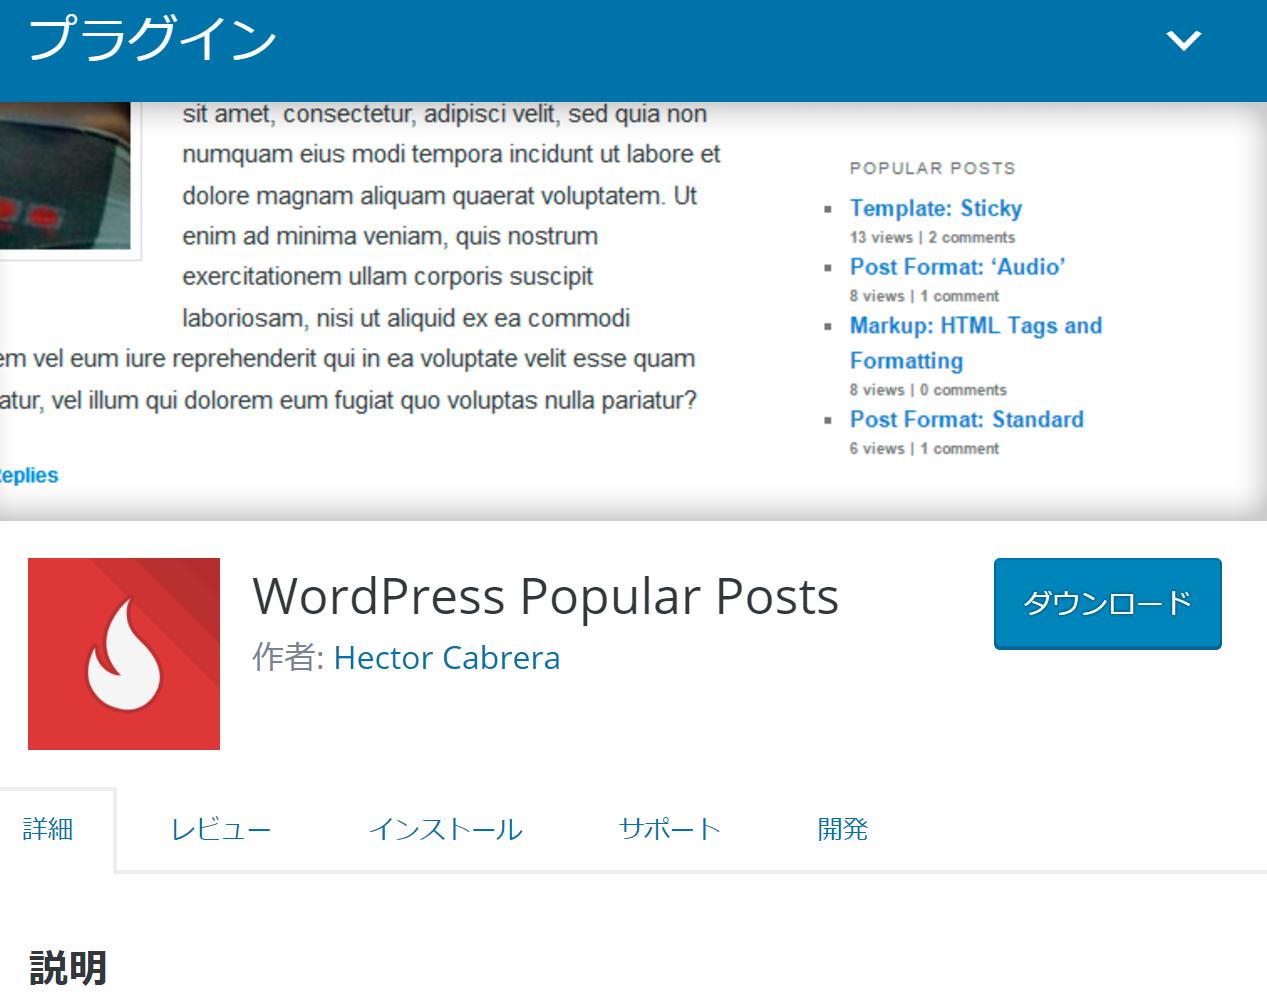 official pp - WordPress Popular Postsの設定・日本語化・カスタマイズ方法のまとめ